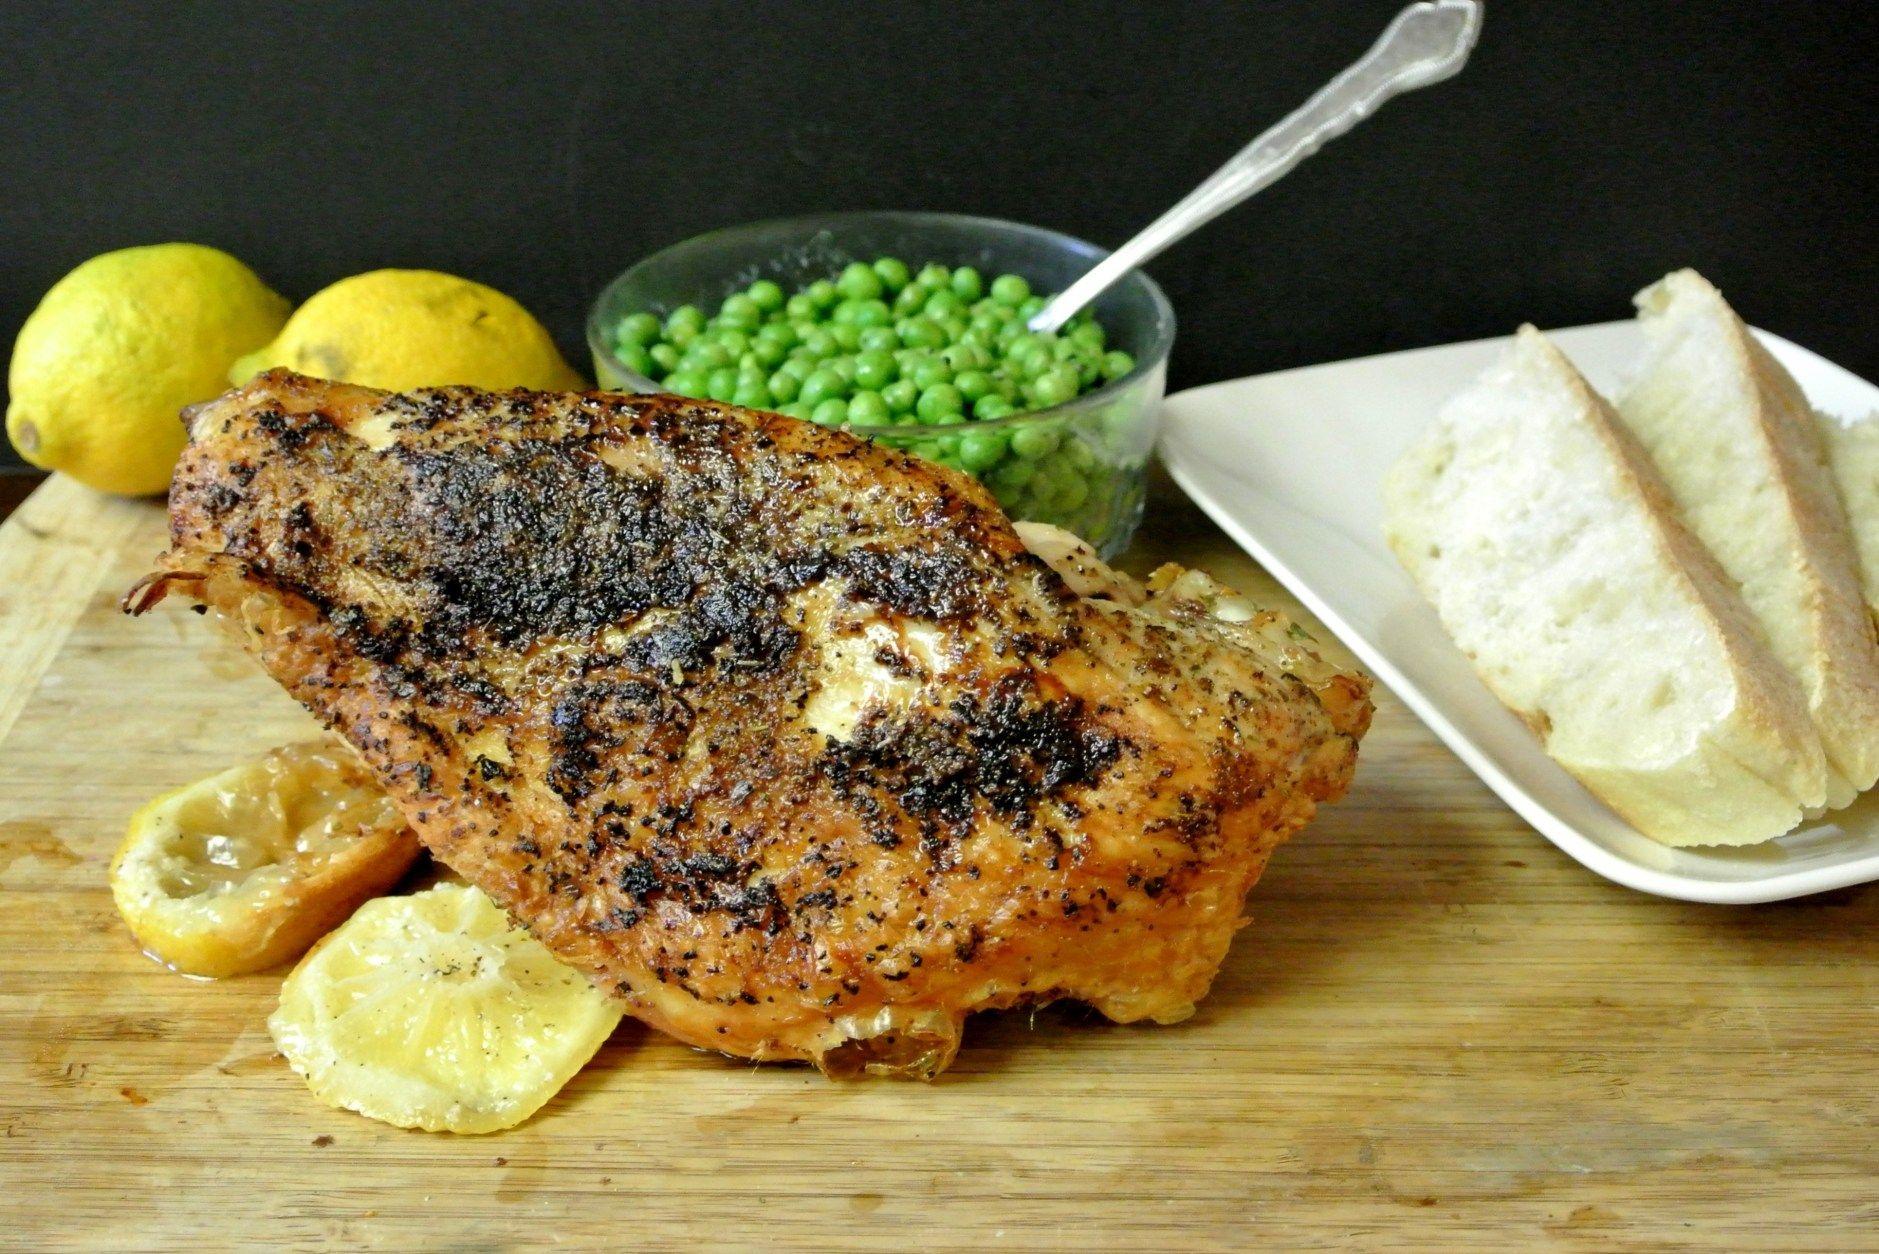 Herb roasted turkey breast with pan gravy recipe